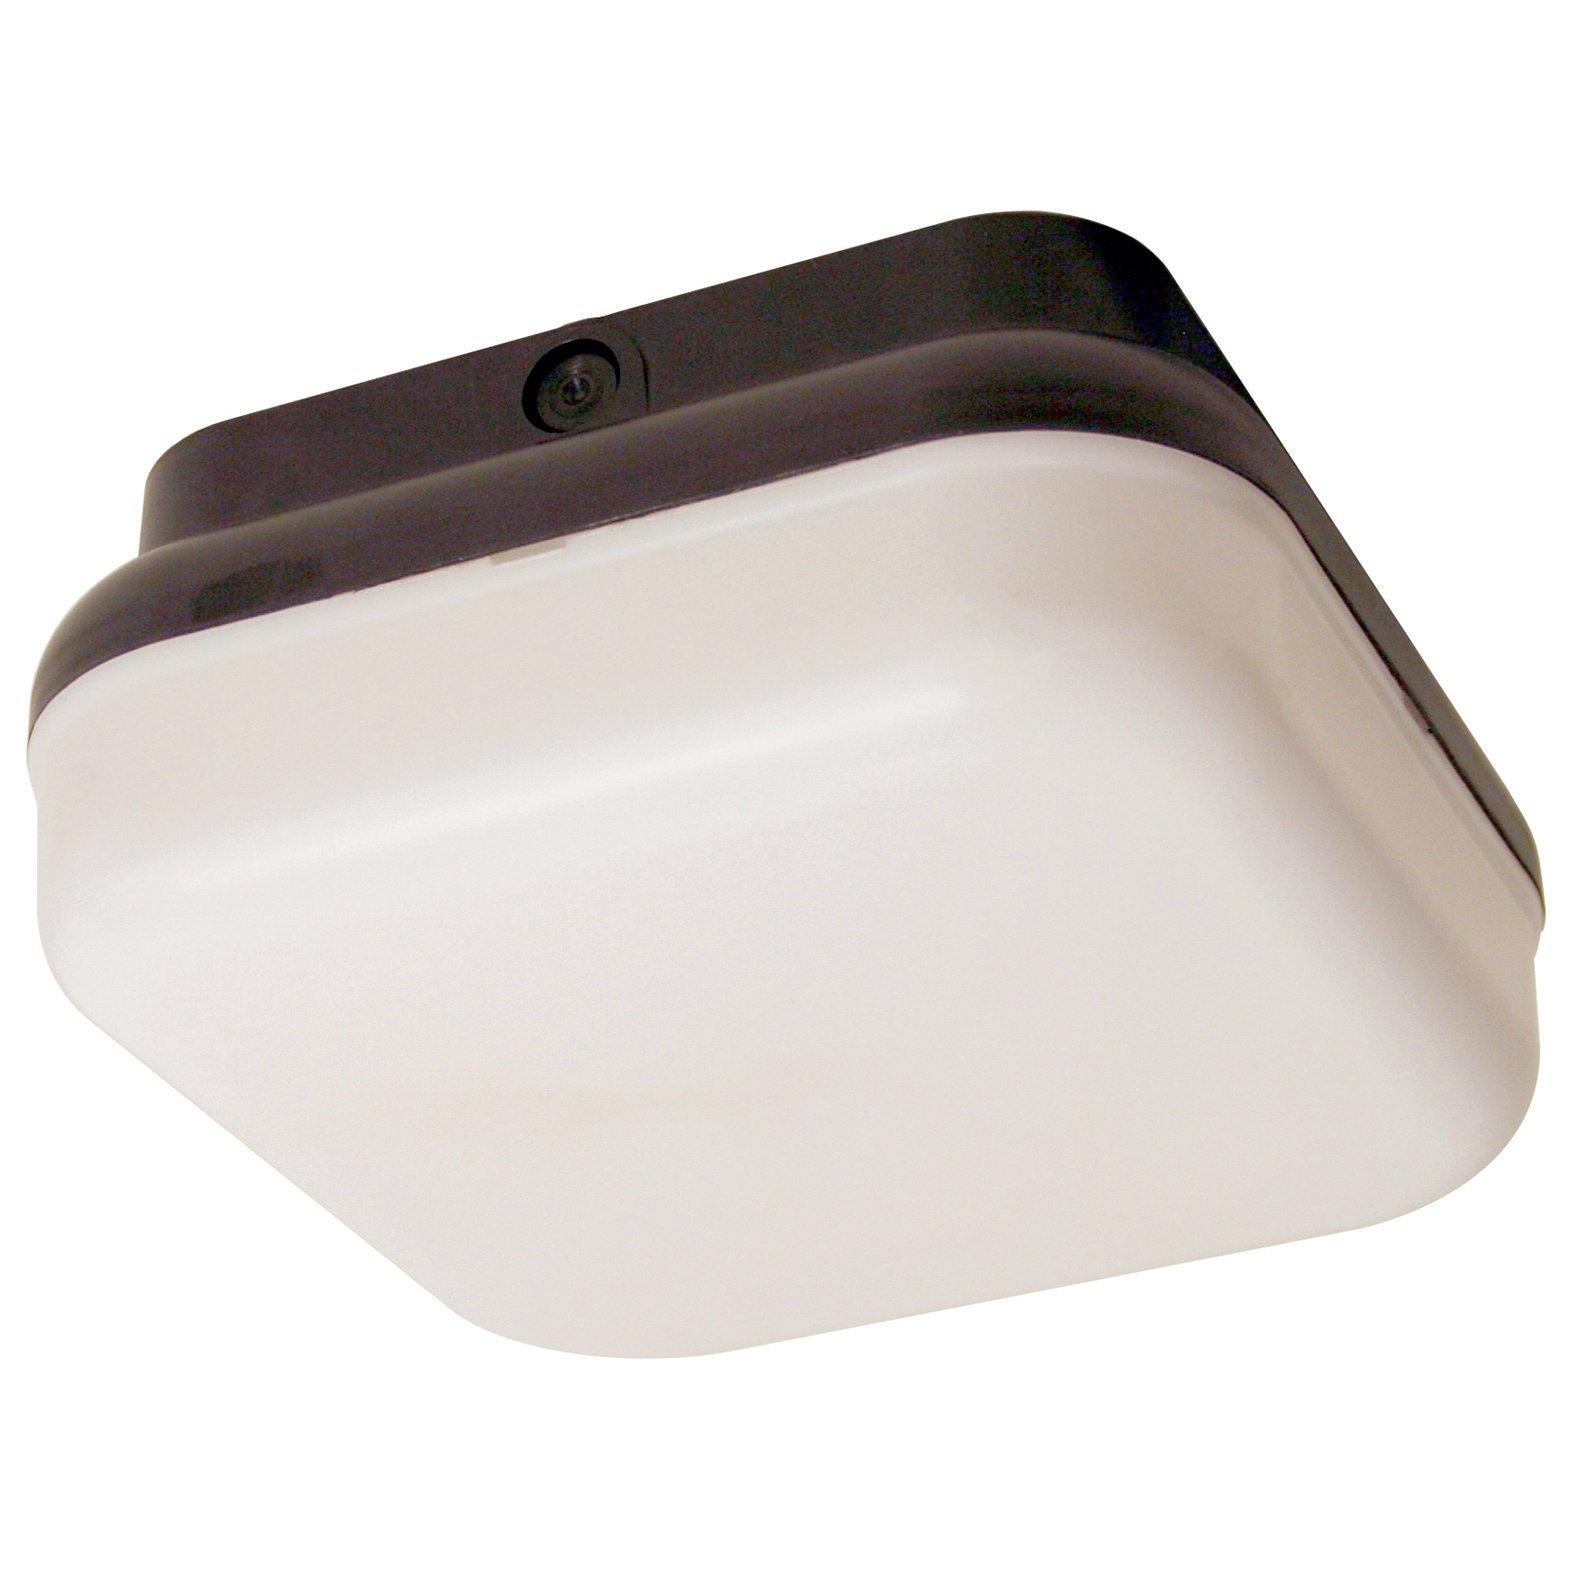 Sunlite 48218-SU DOD/PTS/BK/WH/GU24 Decorative Outdoor Energy Saving Protek Square Polycarbonate Fixture, Black Finish, White Lens by Sunlite